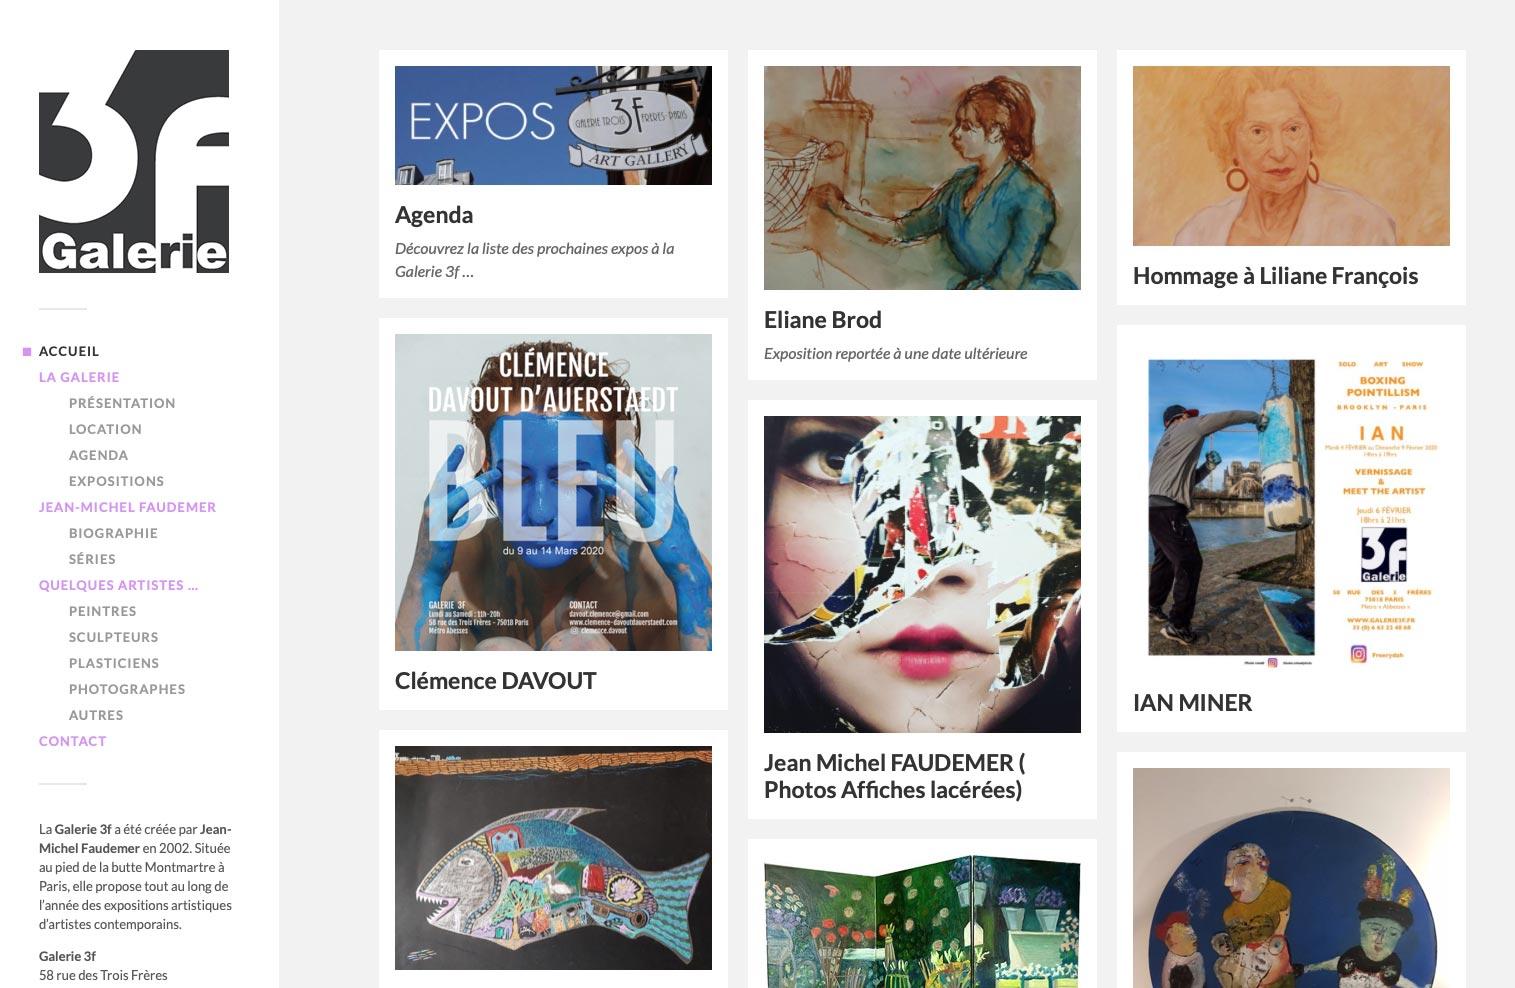 Galerie 3f site internet